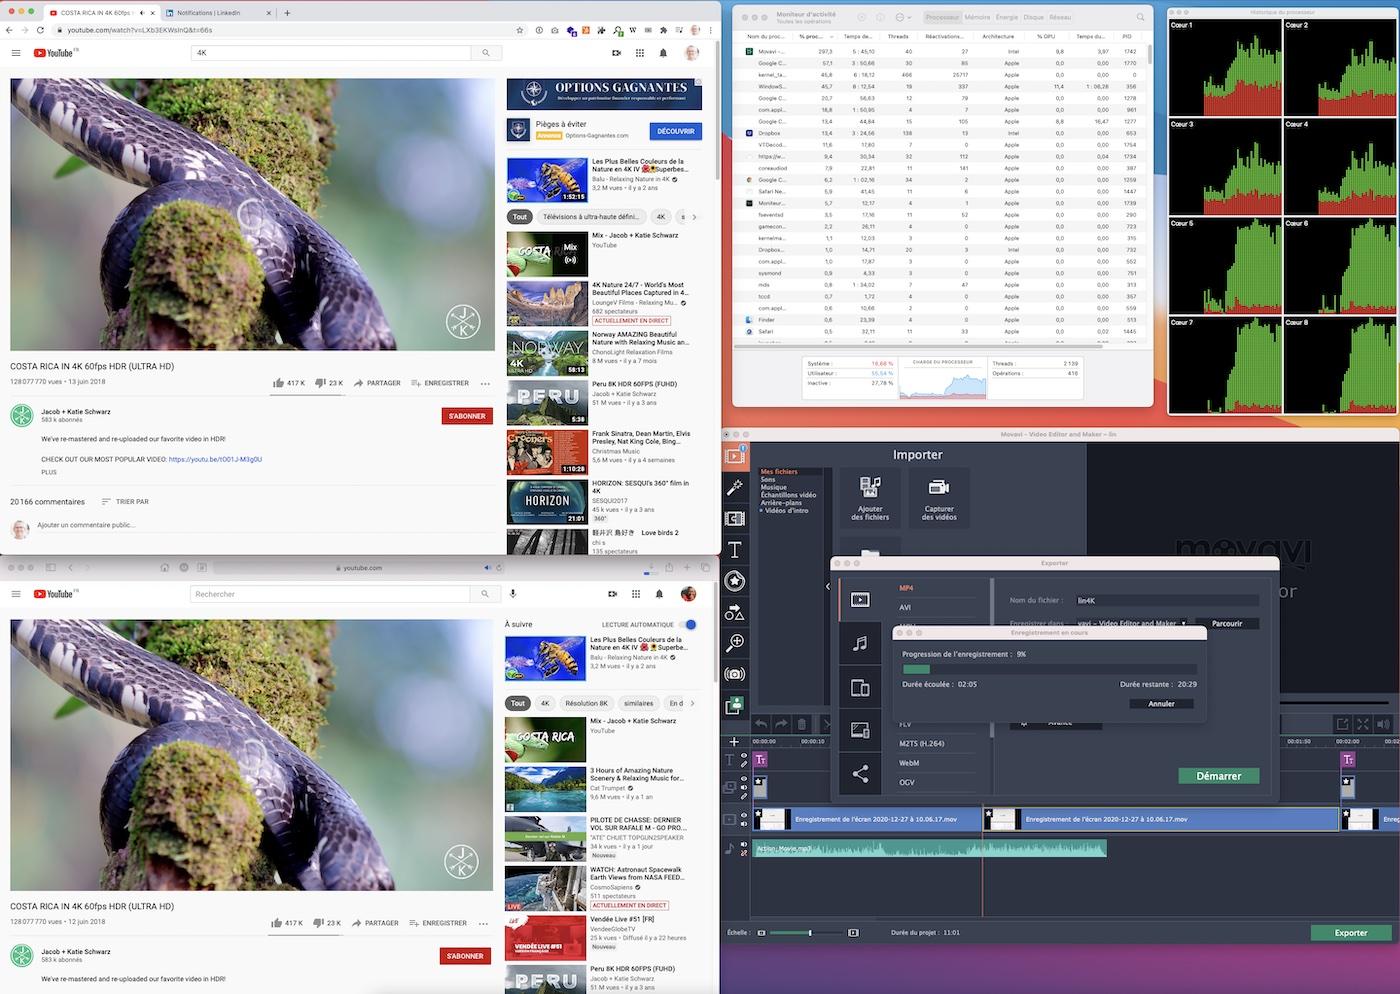 bench M1 video 4HK dropbox encodage